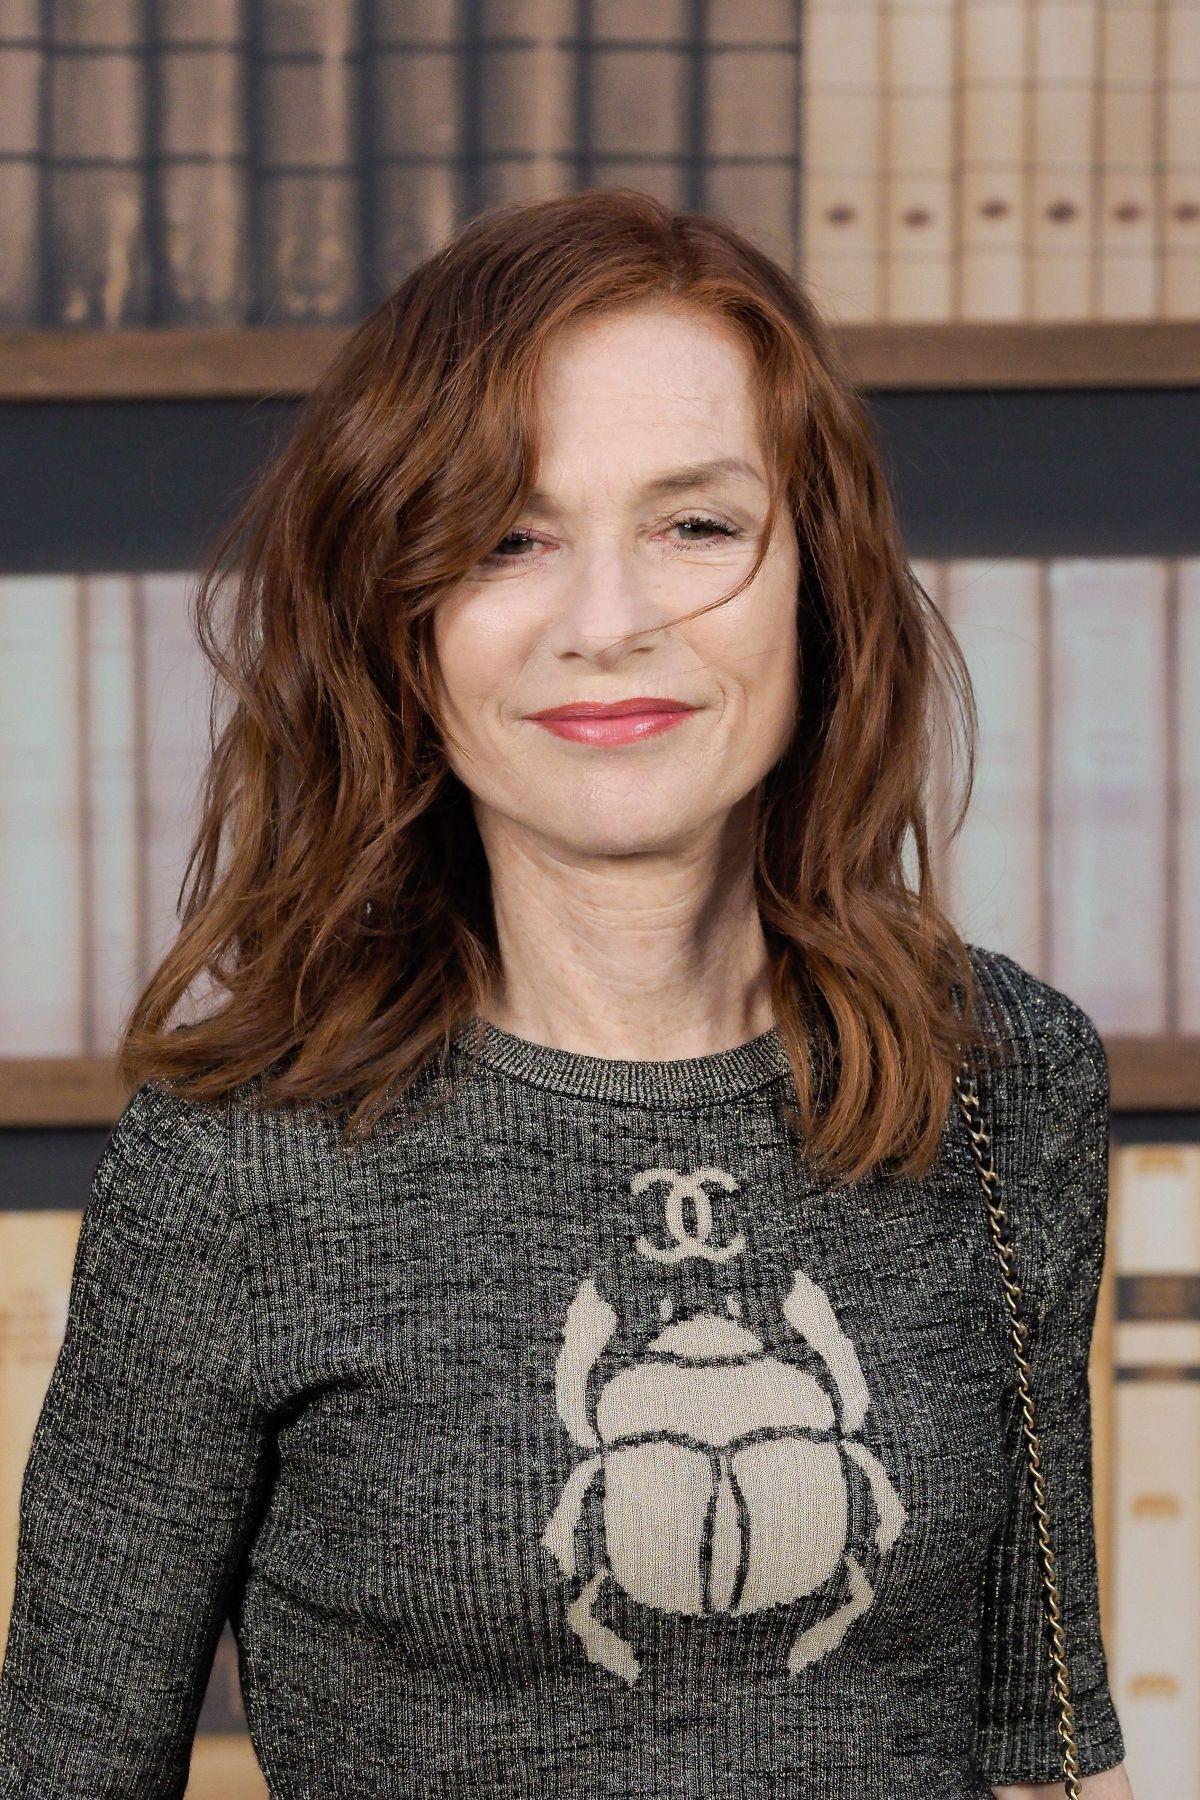 Isabelle Huppert | Cinemorgue Wiki | FANDOM powered by Wikia